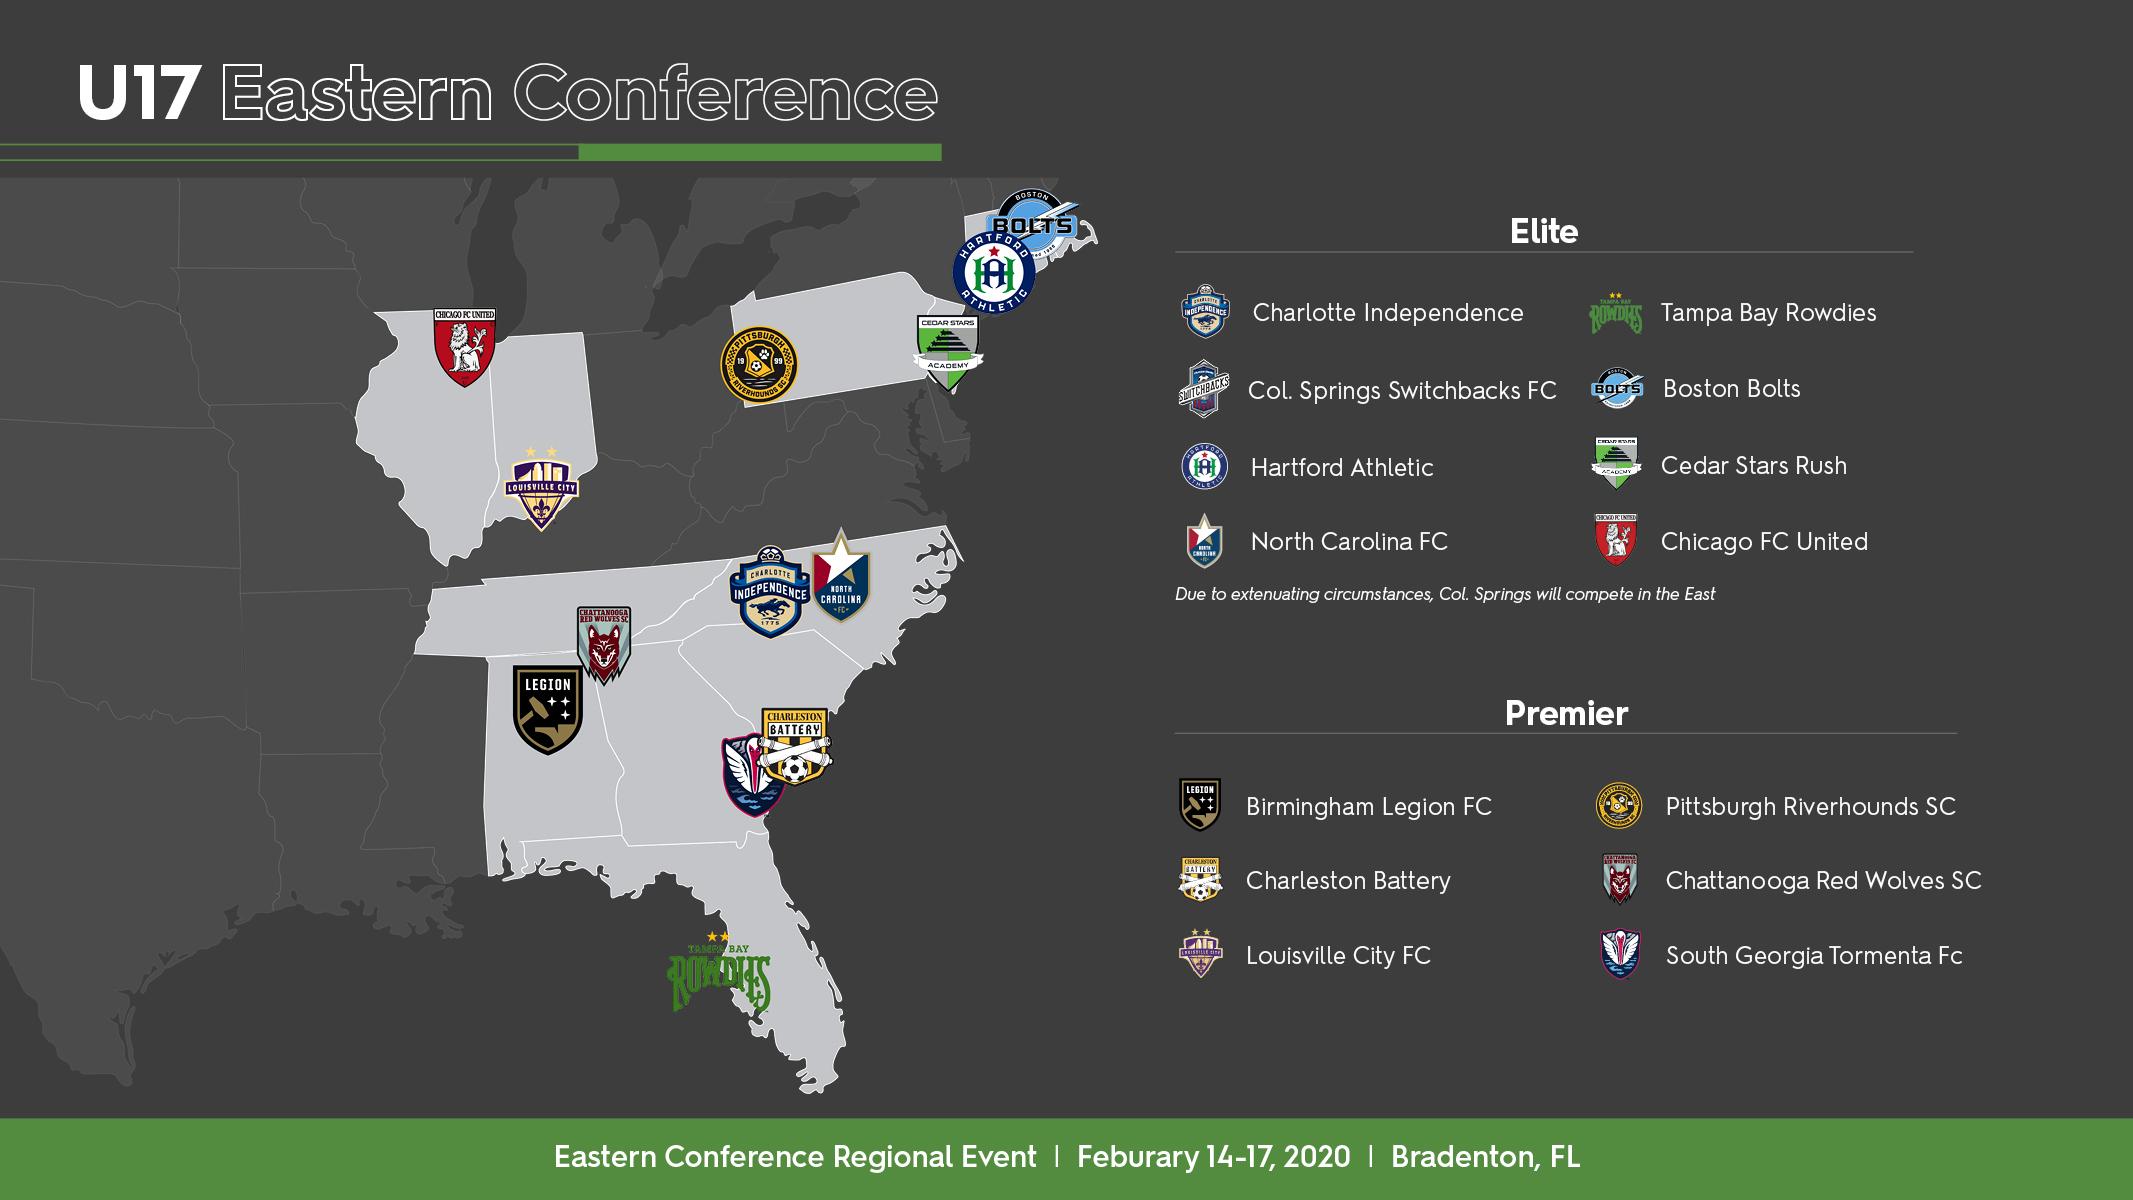 U17 Eastern Conference